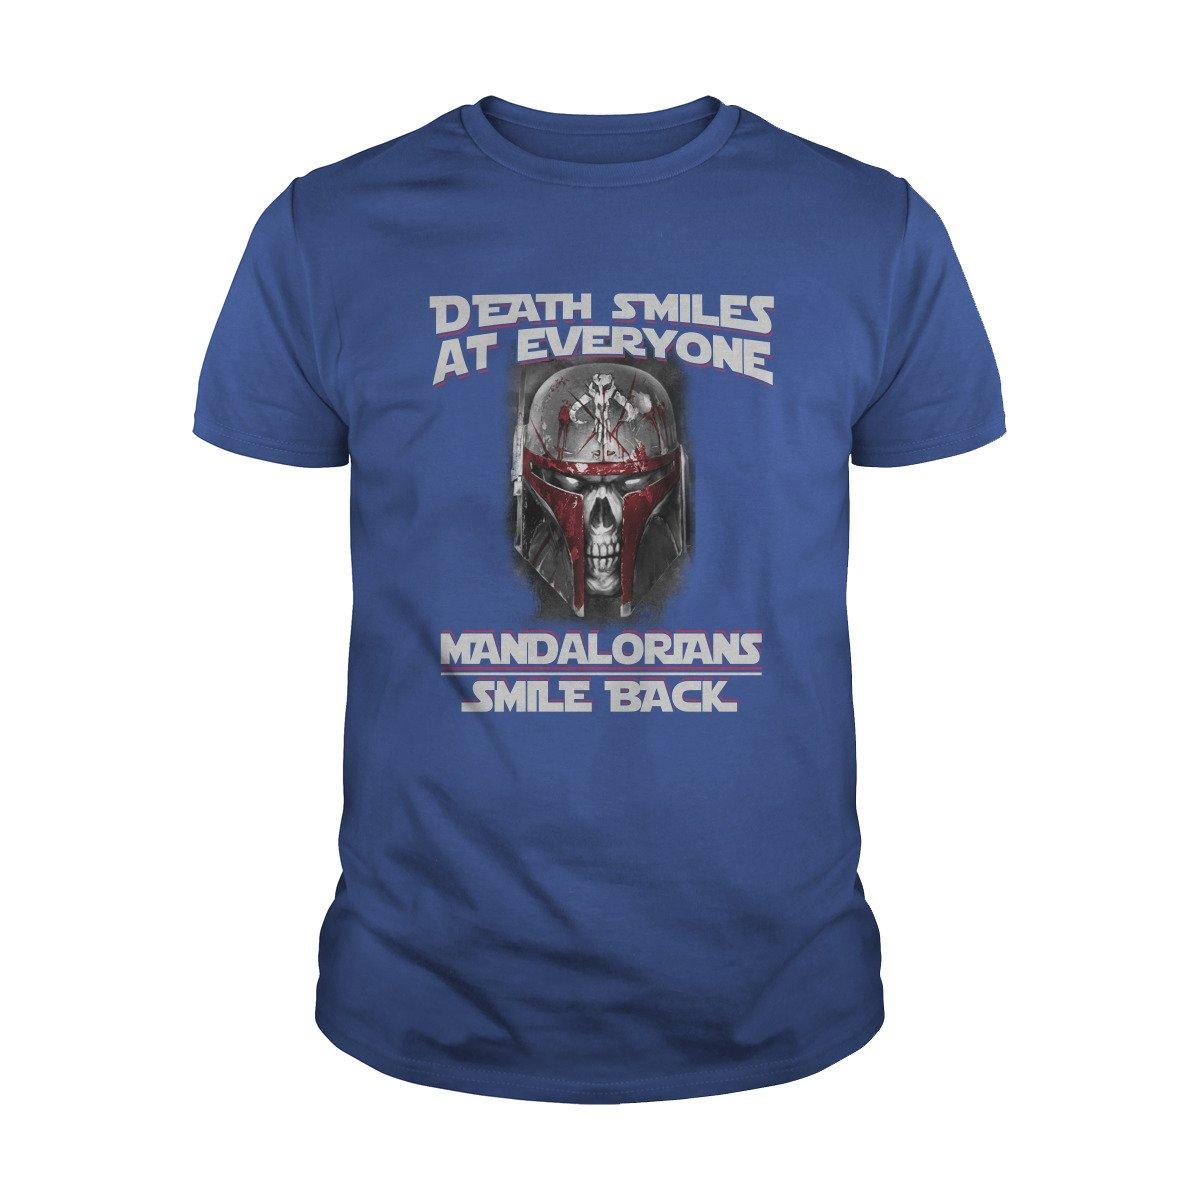 Death Smiles at Everyone Mandalorians Smile Back T-Shirt